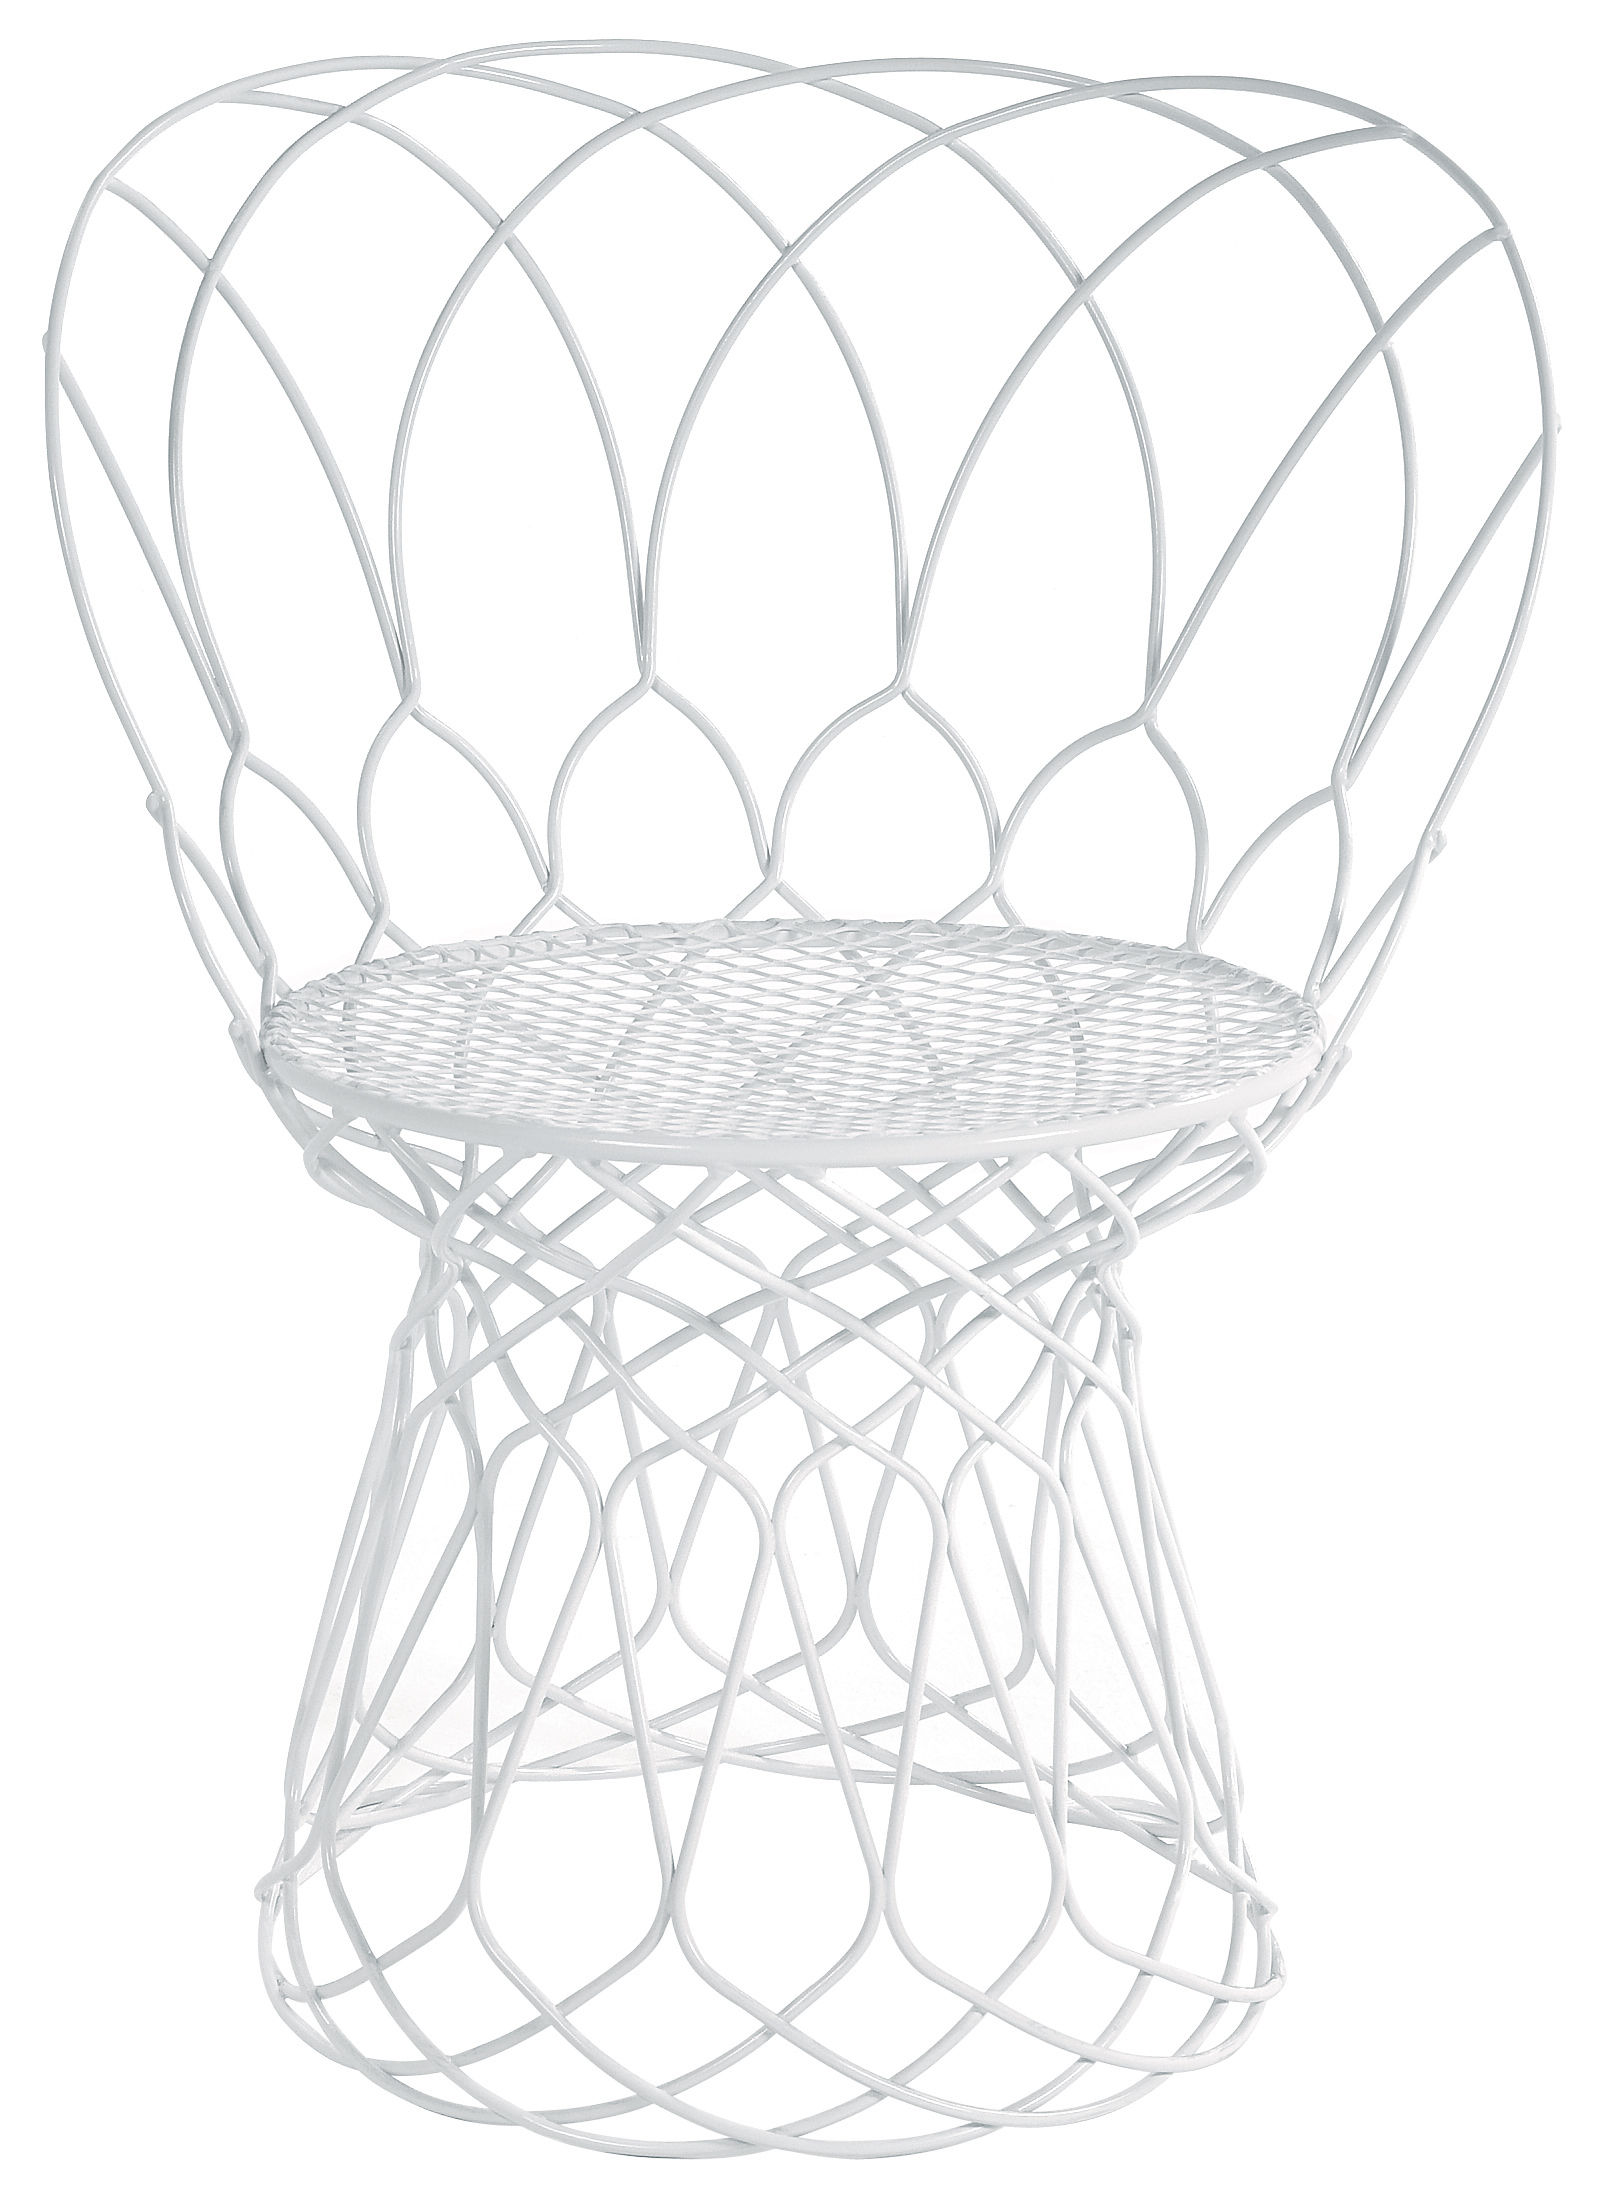 Möbel - Stühle  - Re-trouvé Sessel klein - Emu - Weiß - Stahl